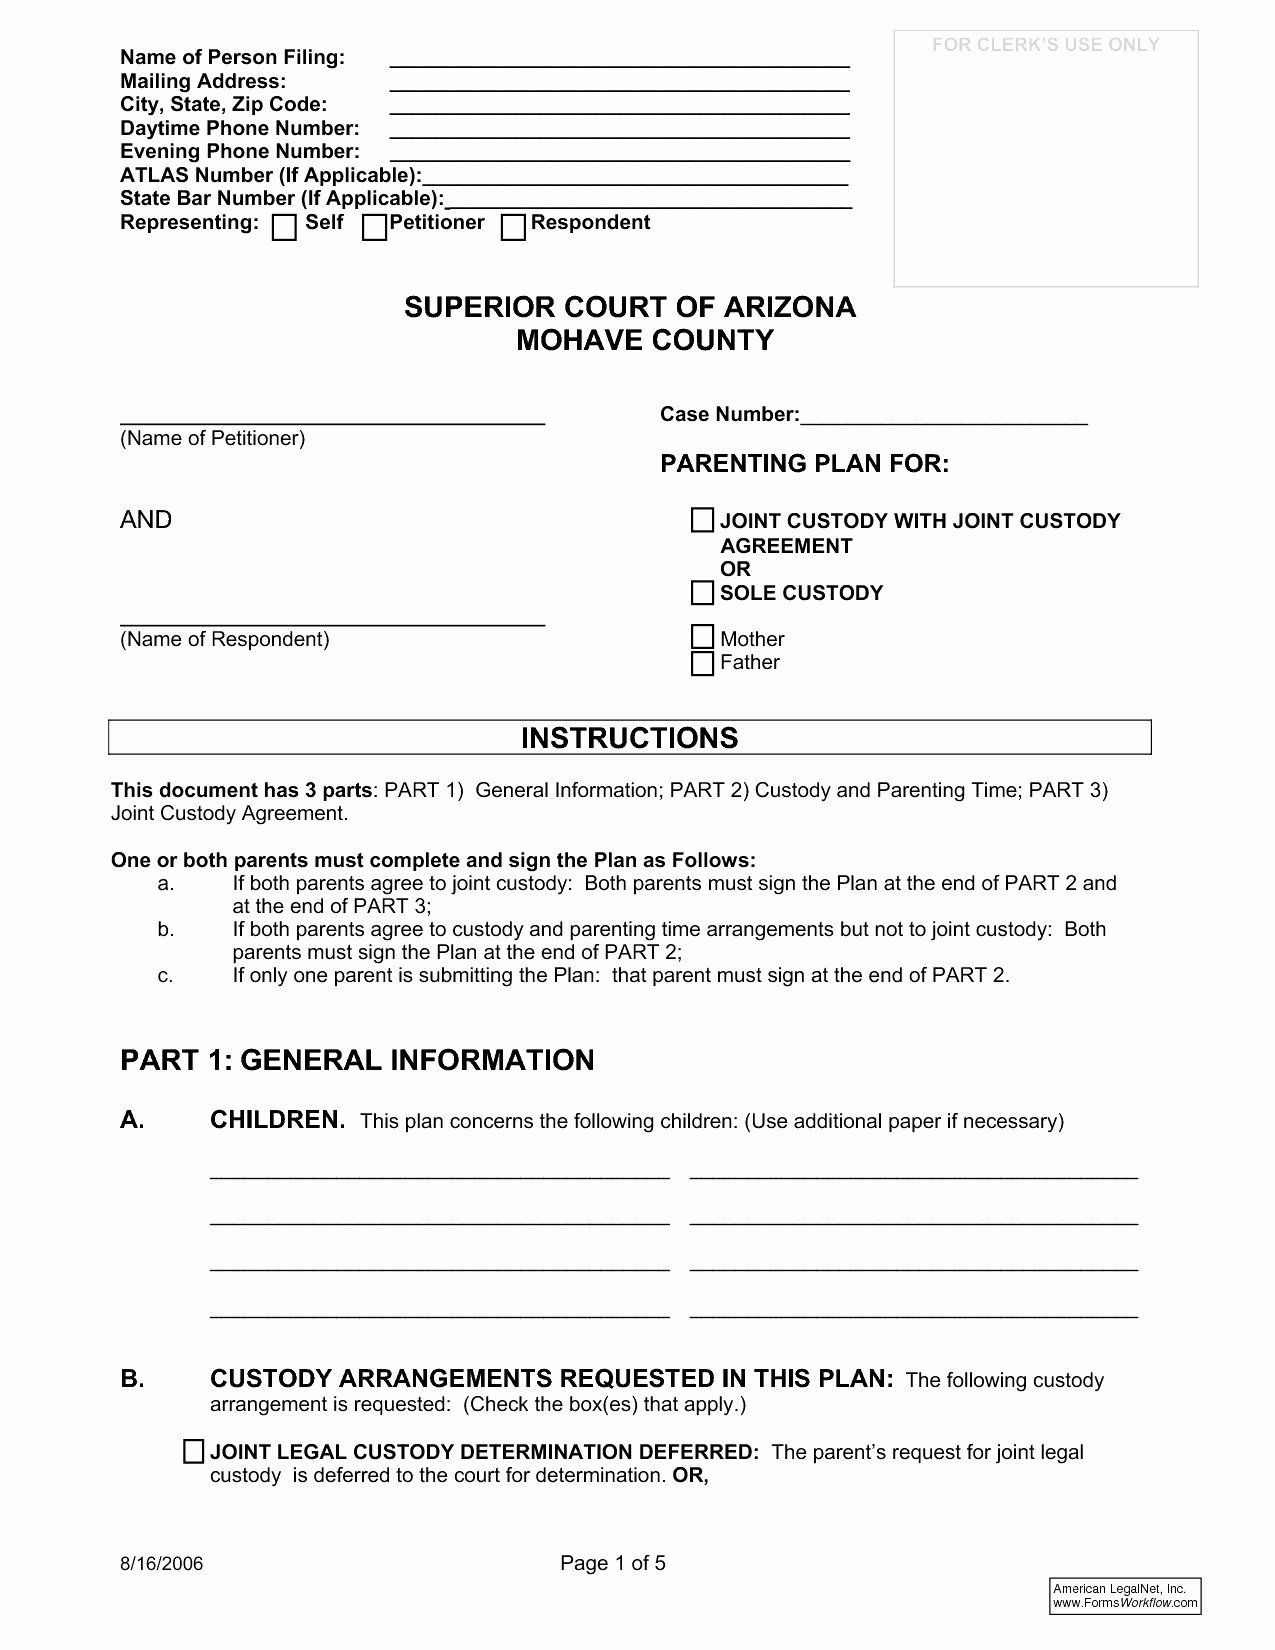 Sample Joint Custody Agreements In